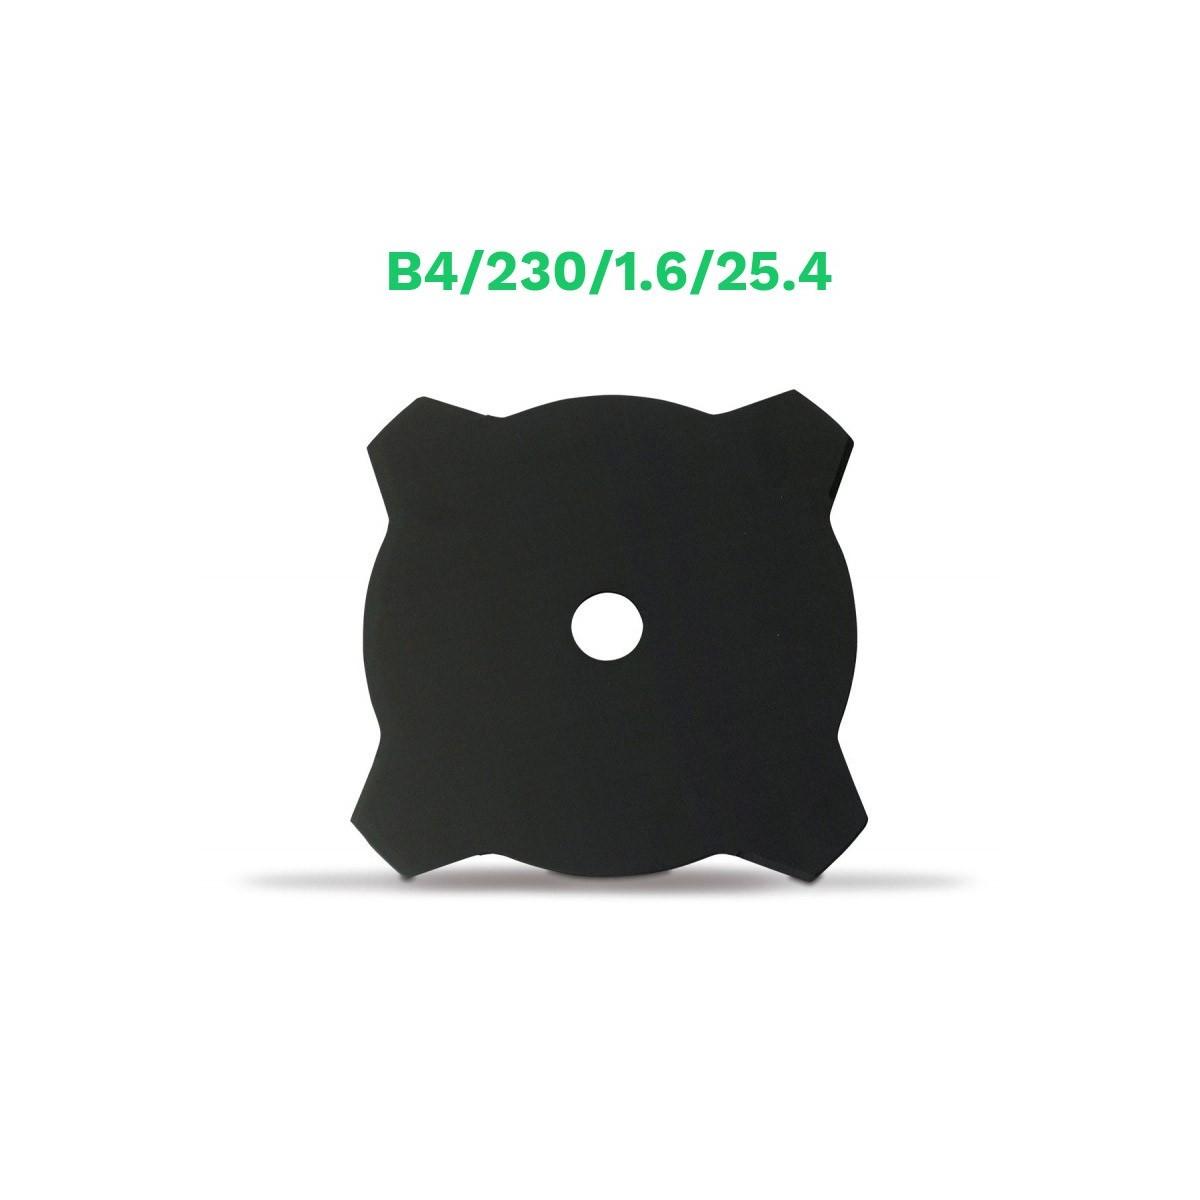 Echo disco metalico 4 puntas b4/230/1.6/25.4